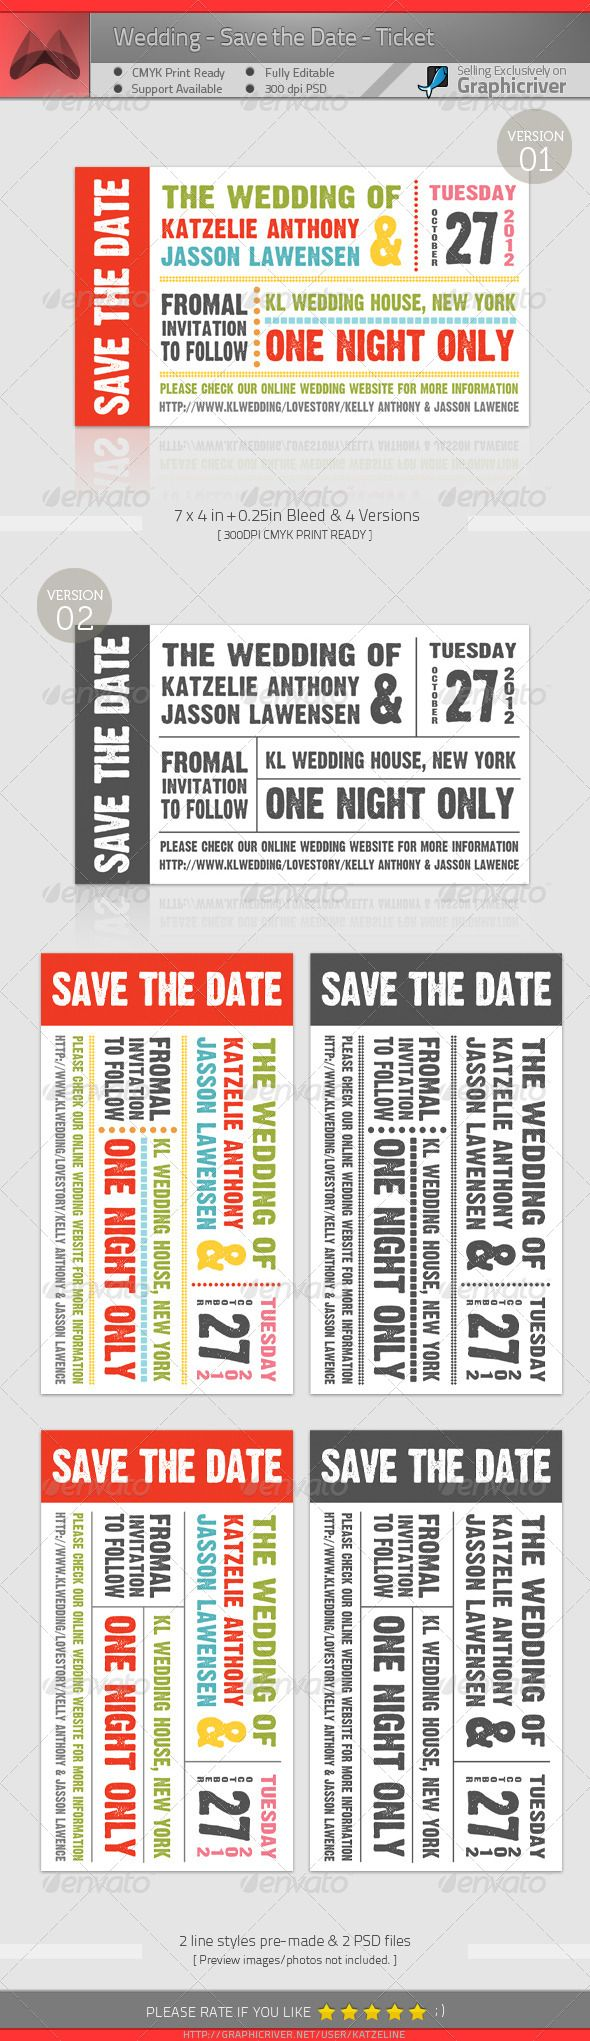 111 best Print Templates images on Pinterest | Print templates ...